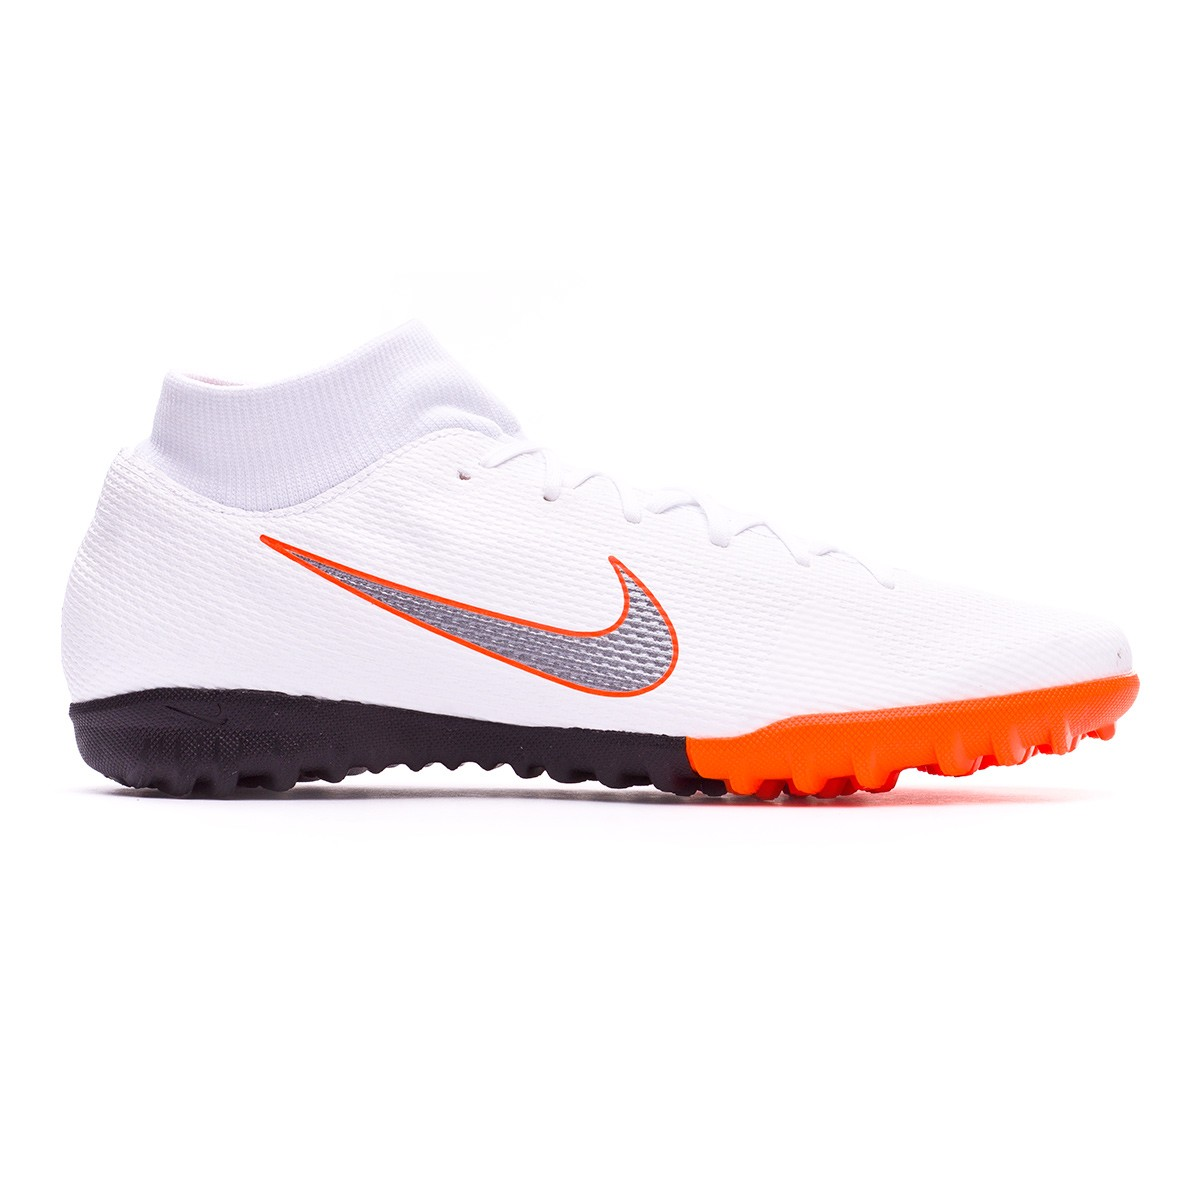 d2e440b02fd1 Football Boot Nike Mercurial SuperflyX VI Academy Turf White-Metallic cool  grey-Total orange - Tienda de fútbol Fútbol Emotion